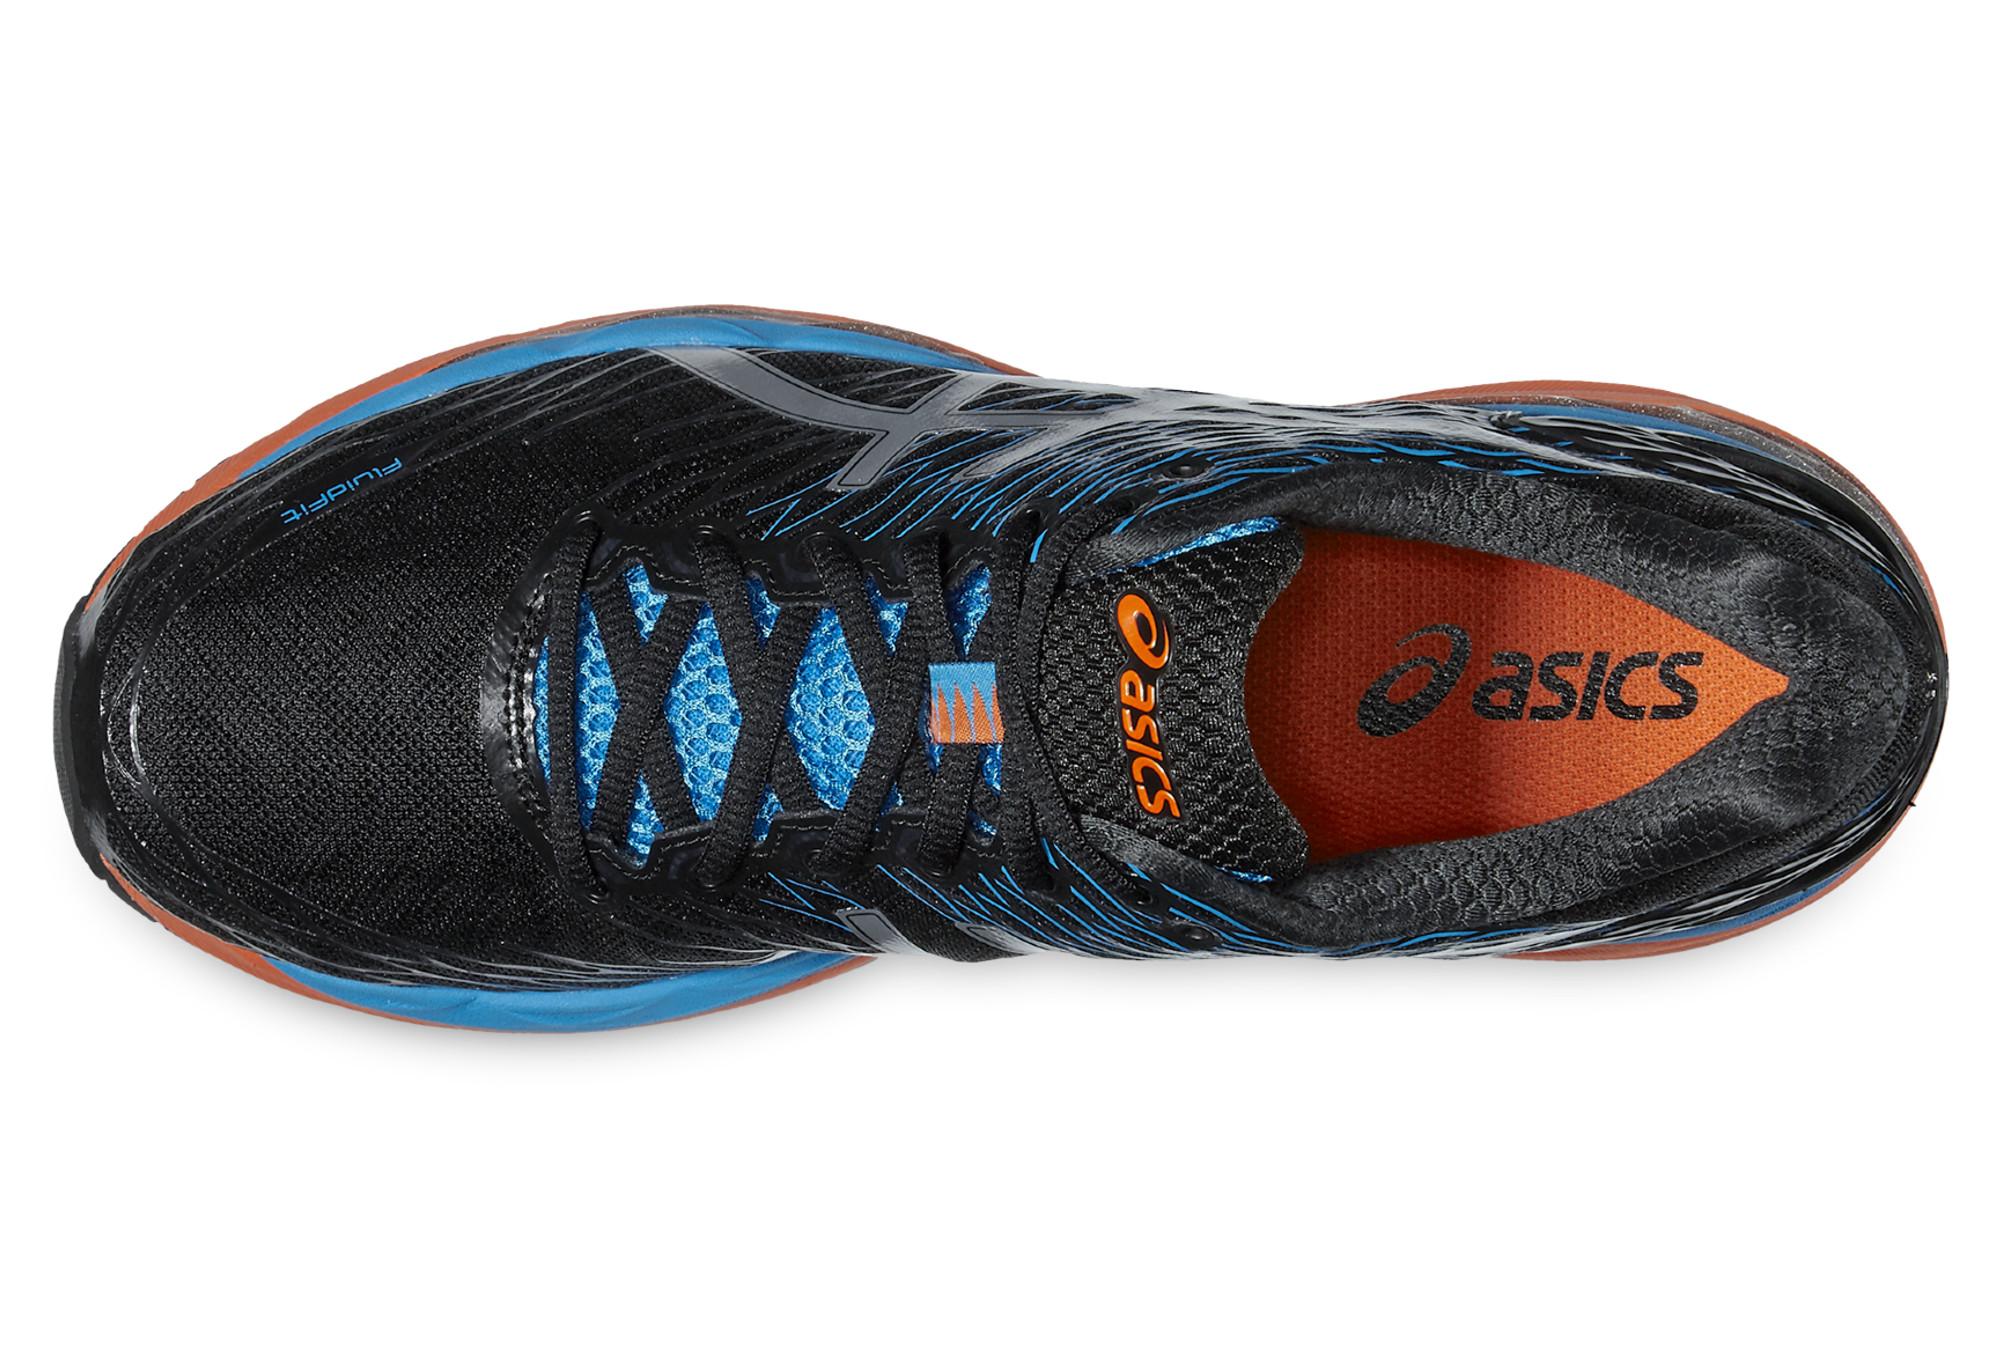 chaussures de running asics nimbus 18 noir bleu orange. Black Bedroom Furniture Sets. Home Design Ideas